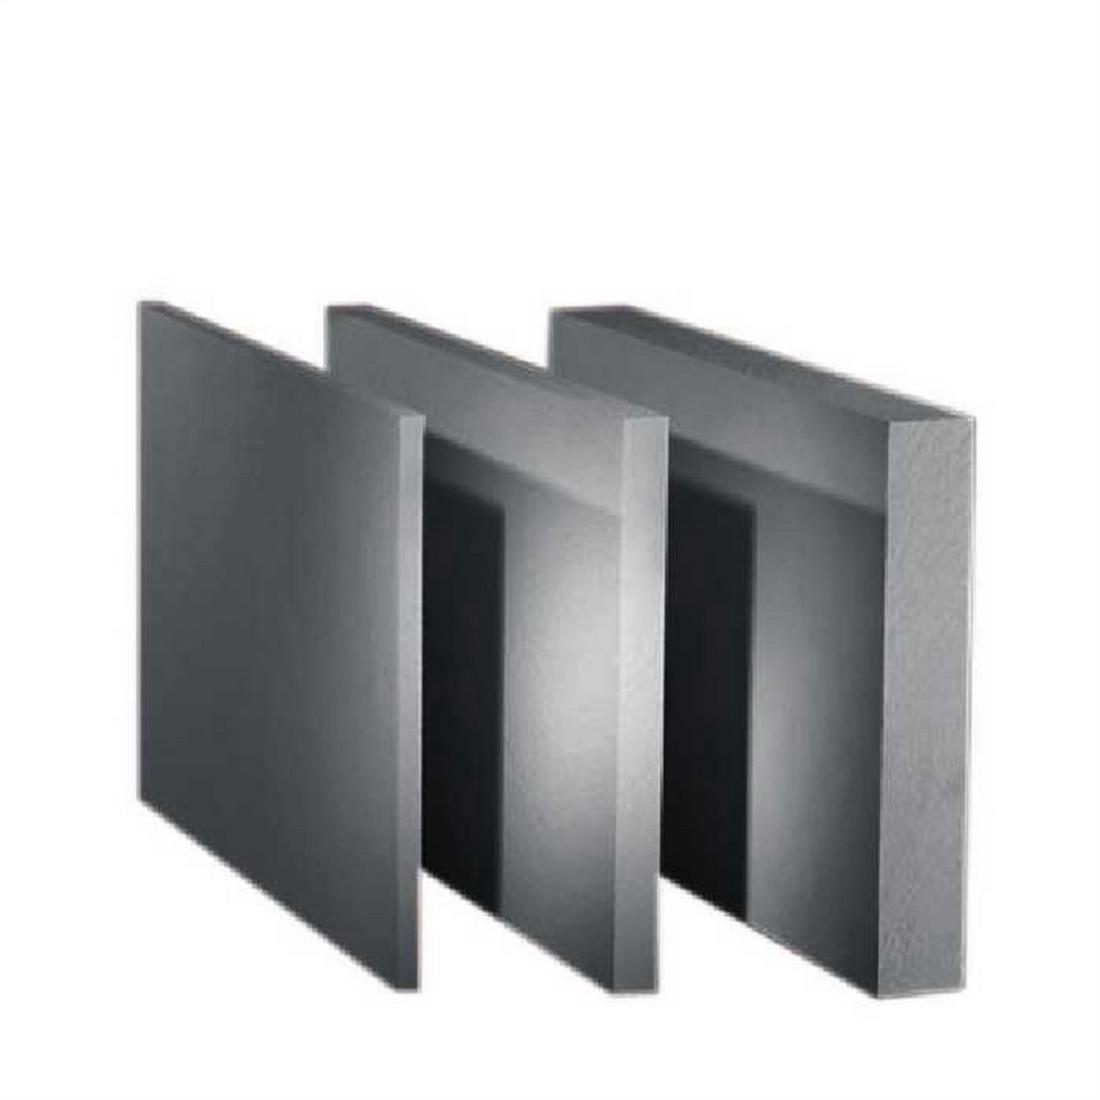 Expol Platinum Board 2400 x 1200 x 25mm R0.78 Black Expanded Polystyrene N2425